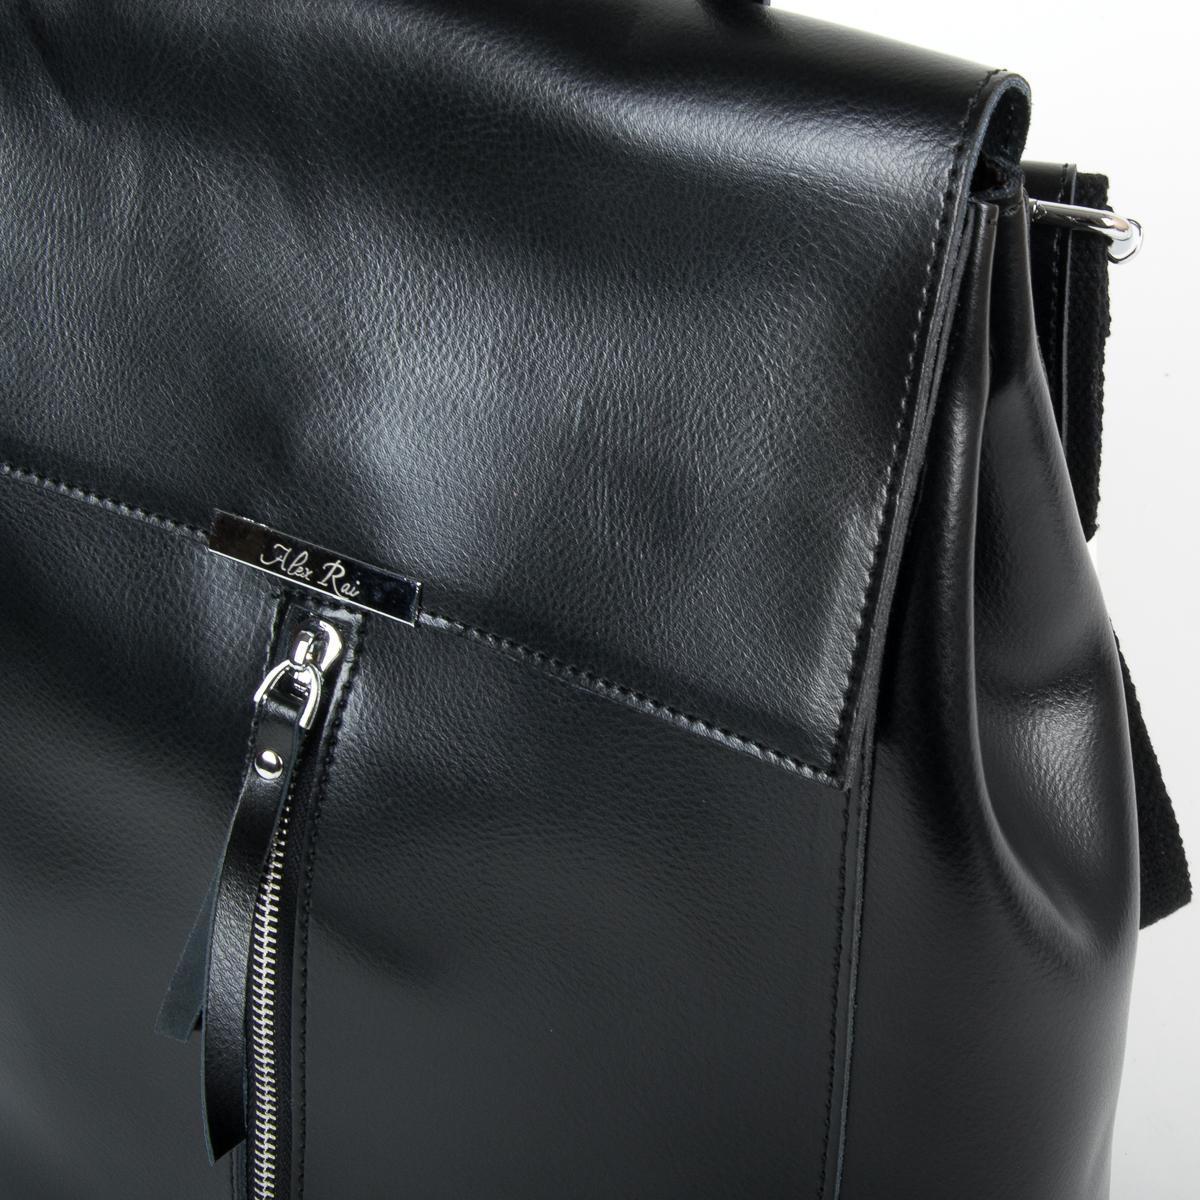 Сумка Женская Рюкзак кожа ALEX RAI 9-01 373 black - фото 3